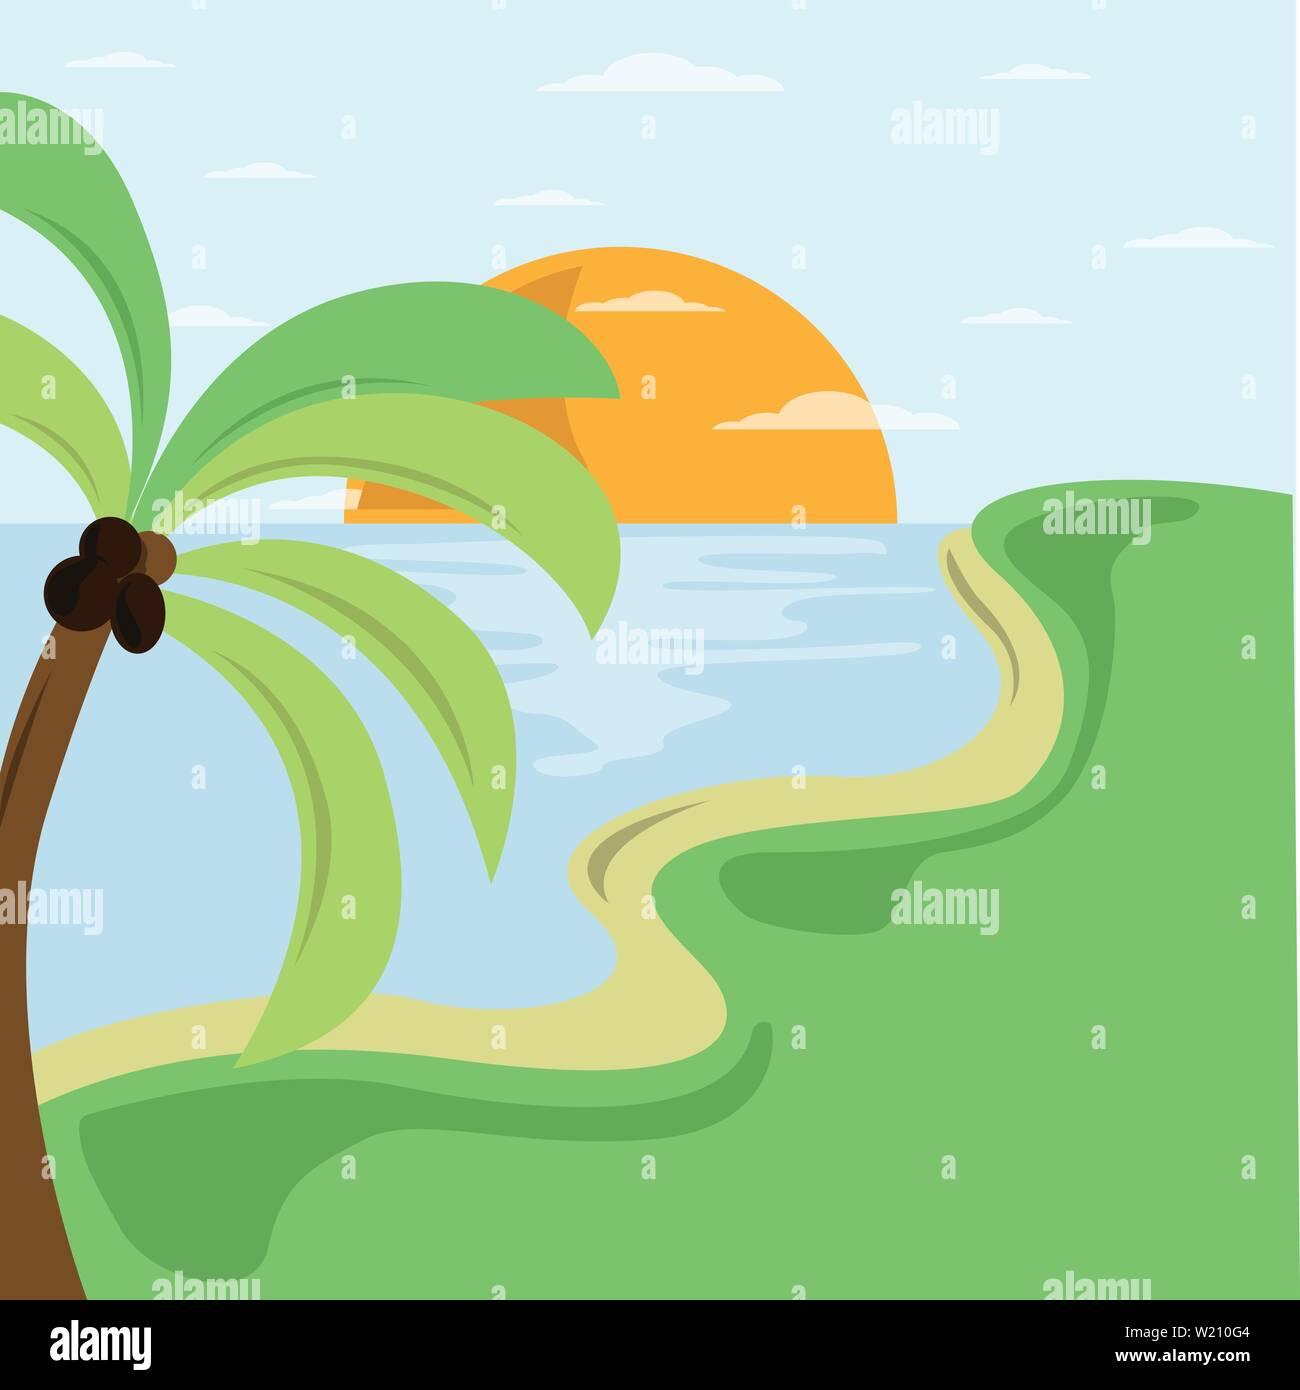 Summer beach illustration on seaside. Vector logo design template. Concept for travel agency tropical resort beach hotel spa. - Stock Vector